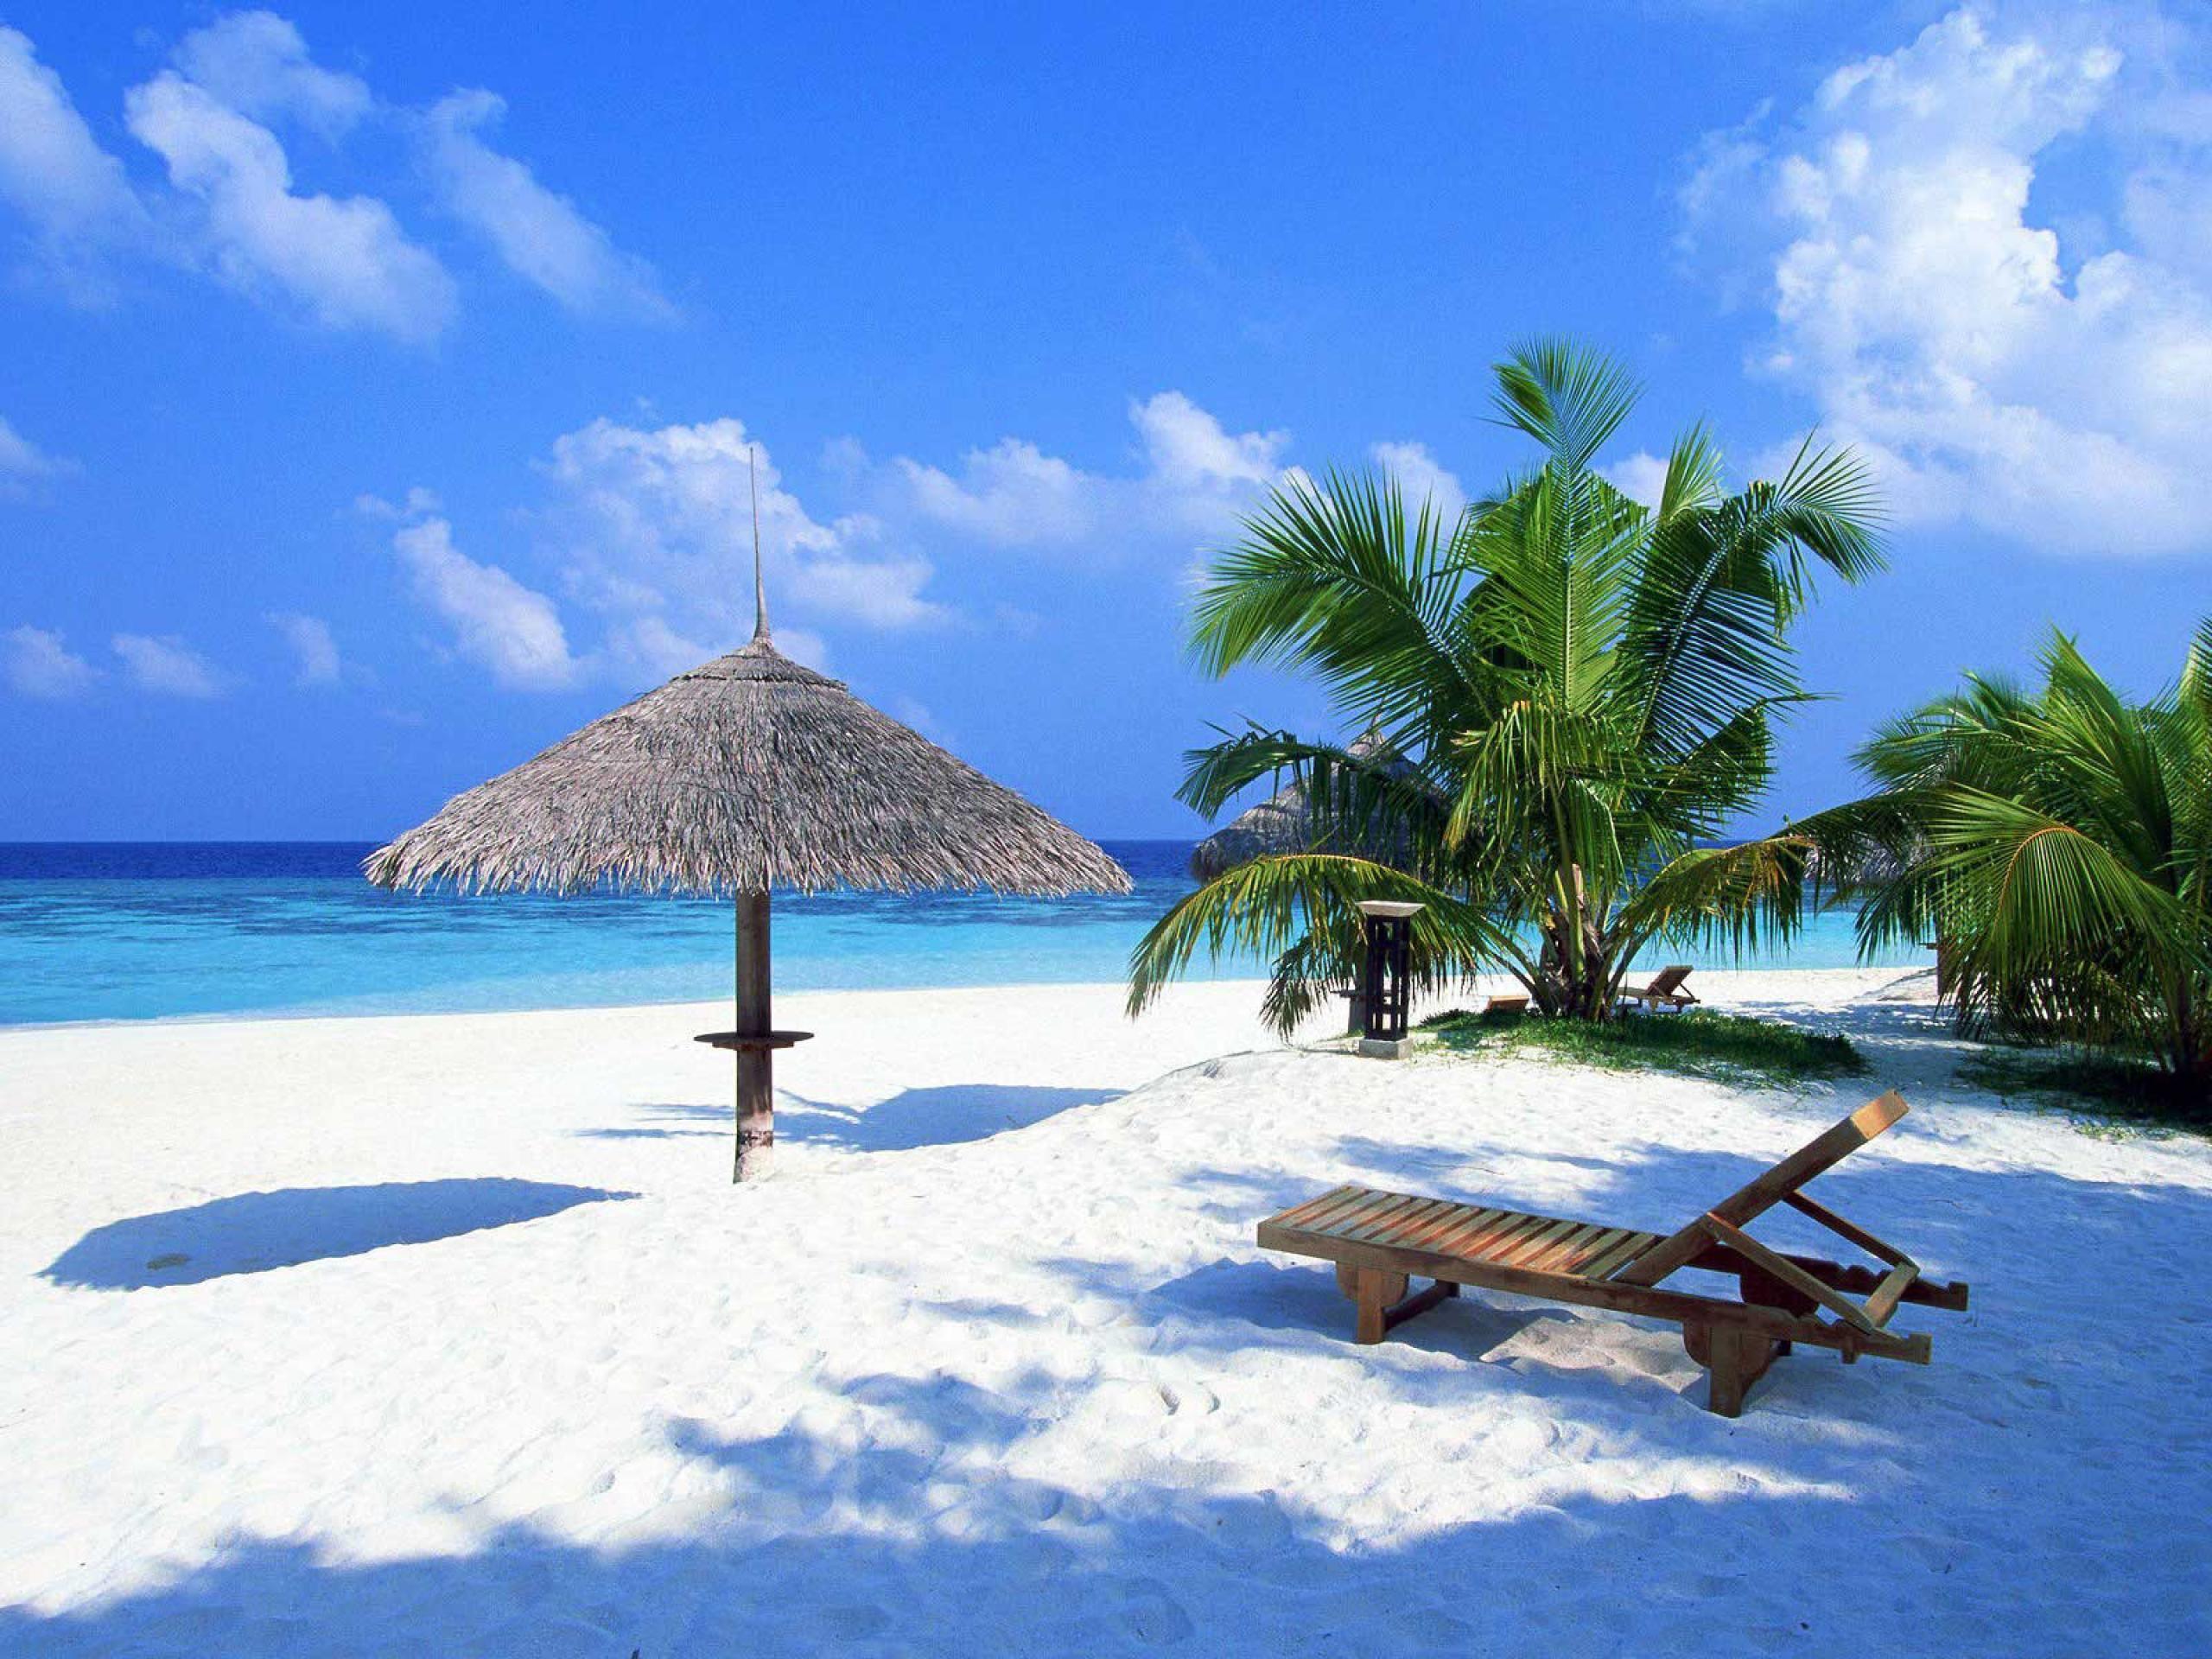 Tropical Beach Vacation Playa Del Carmen Cancun Mexico